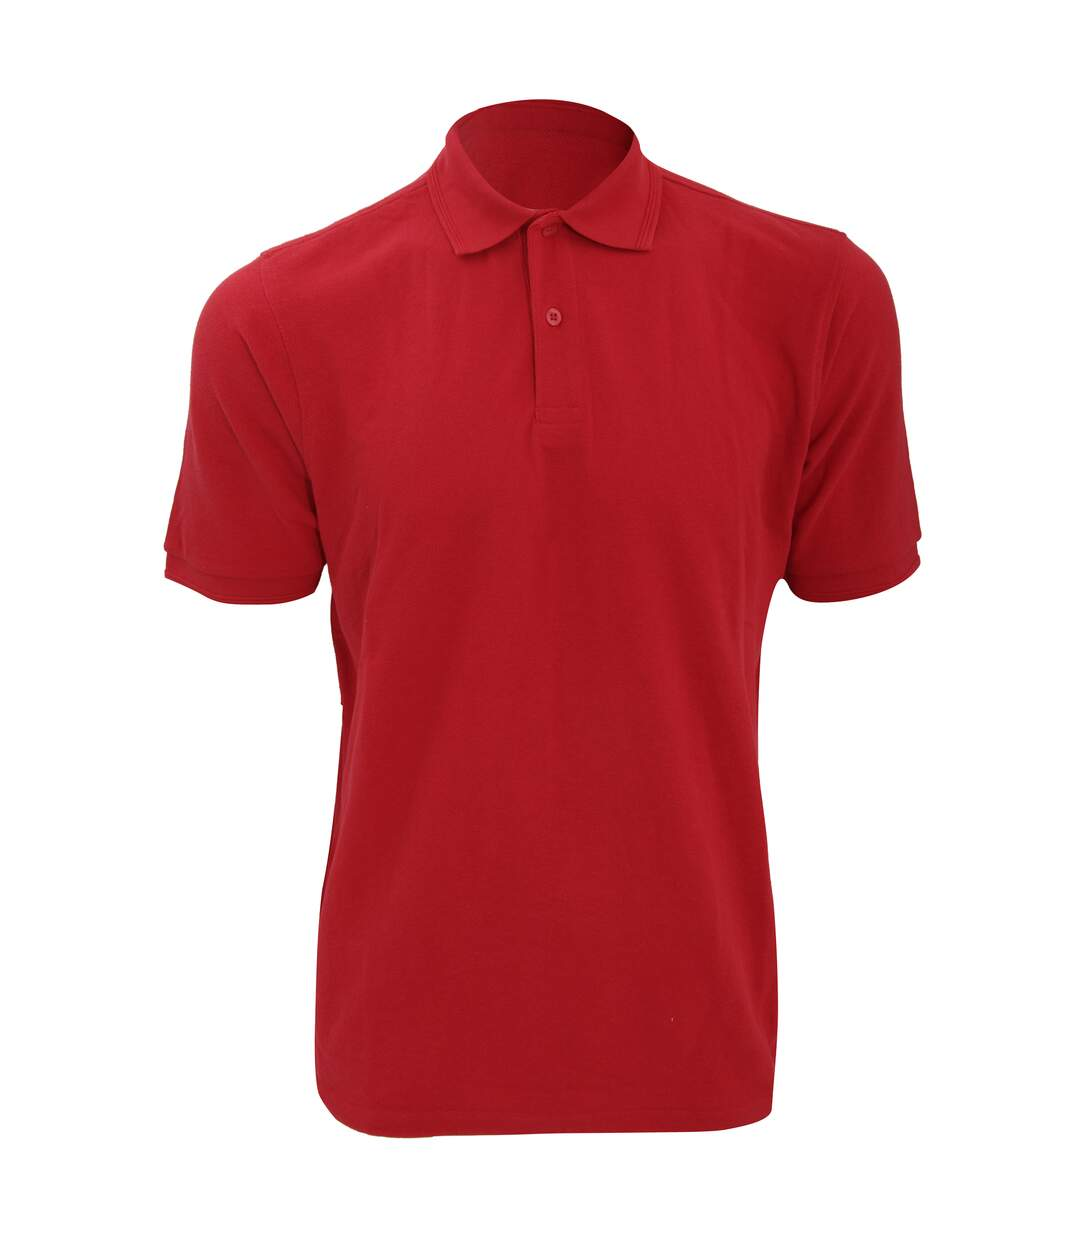 Russell Mens Ripple Collar & Cuff Short Sleeve Polo Shirt (Classic Red) - UTBC572